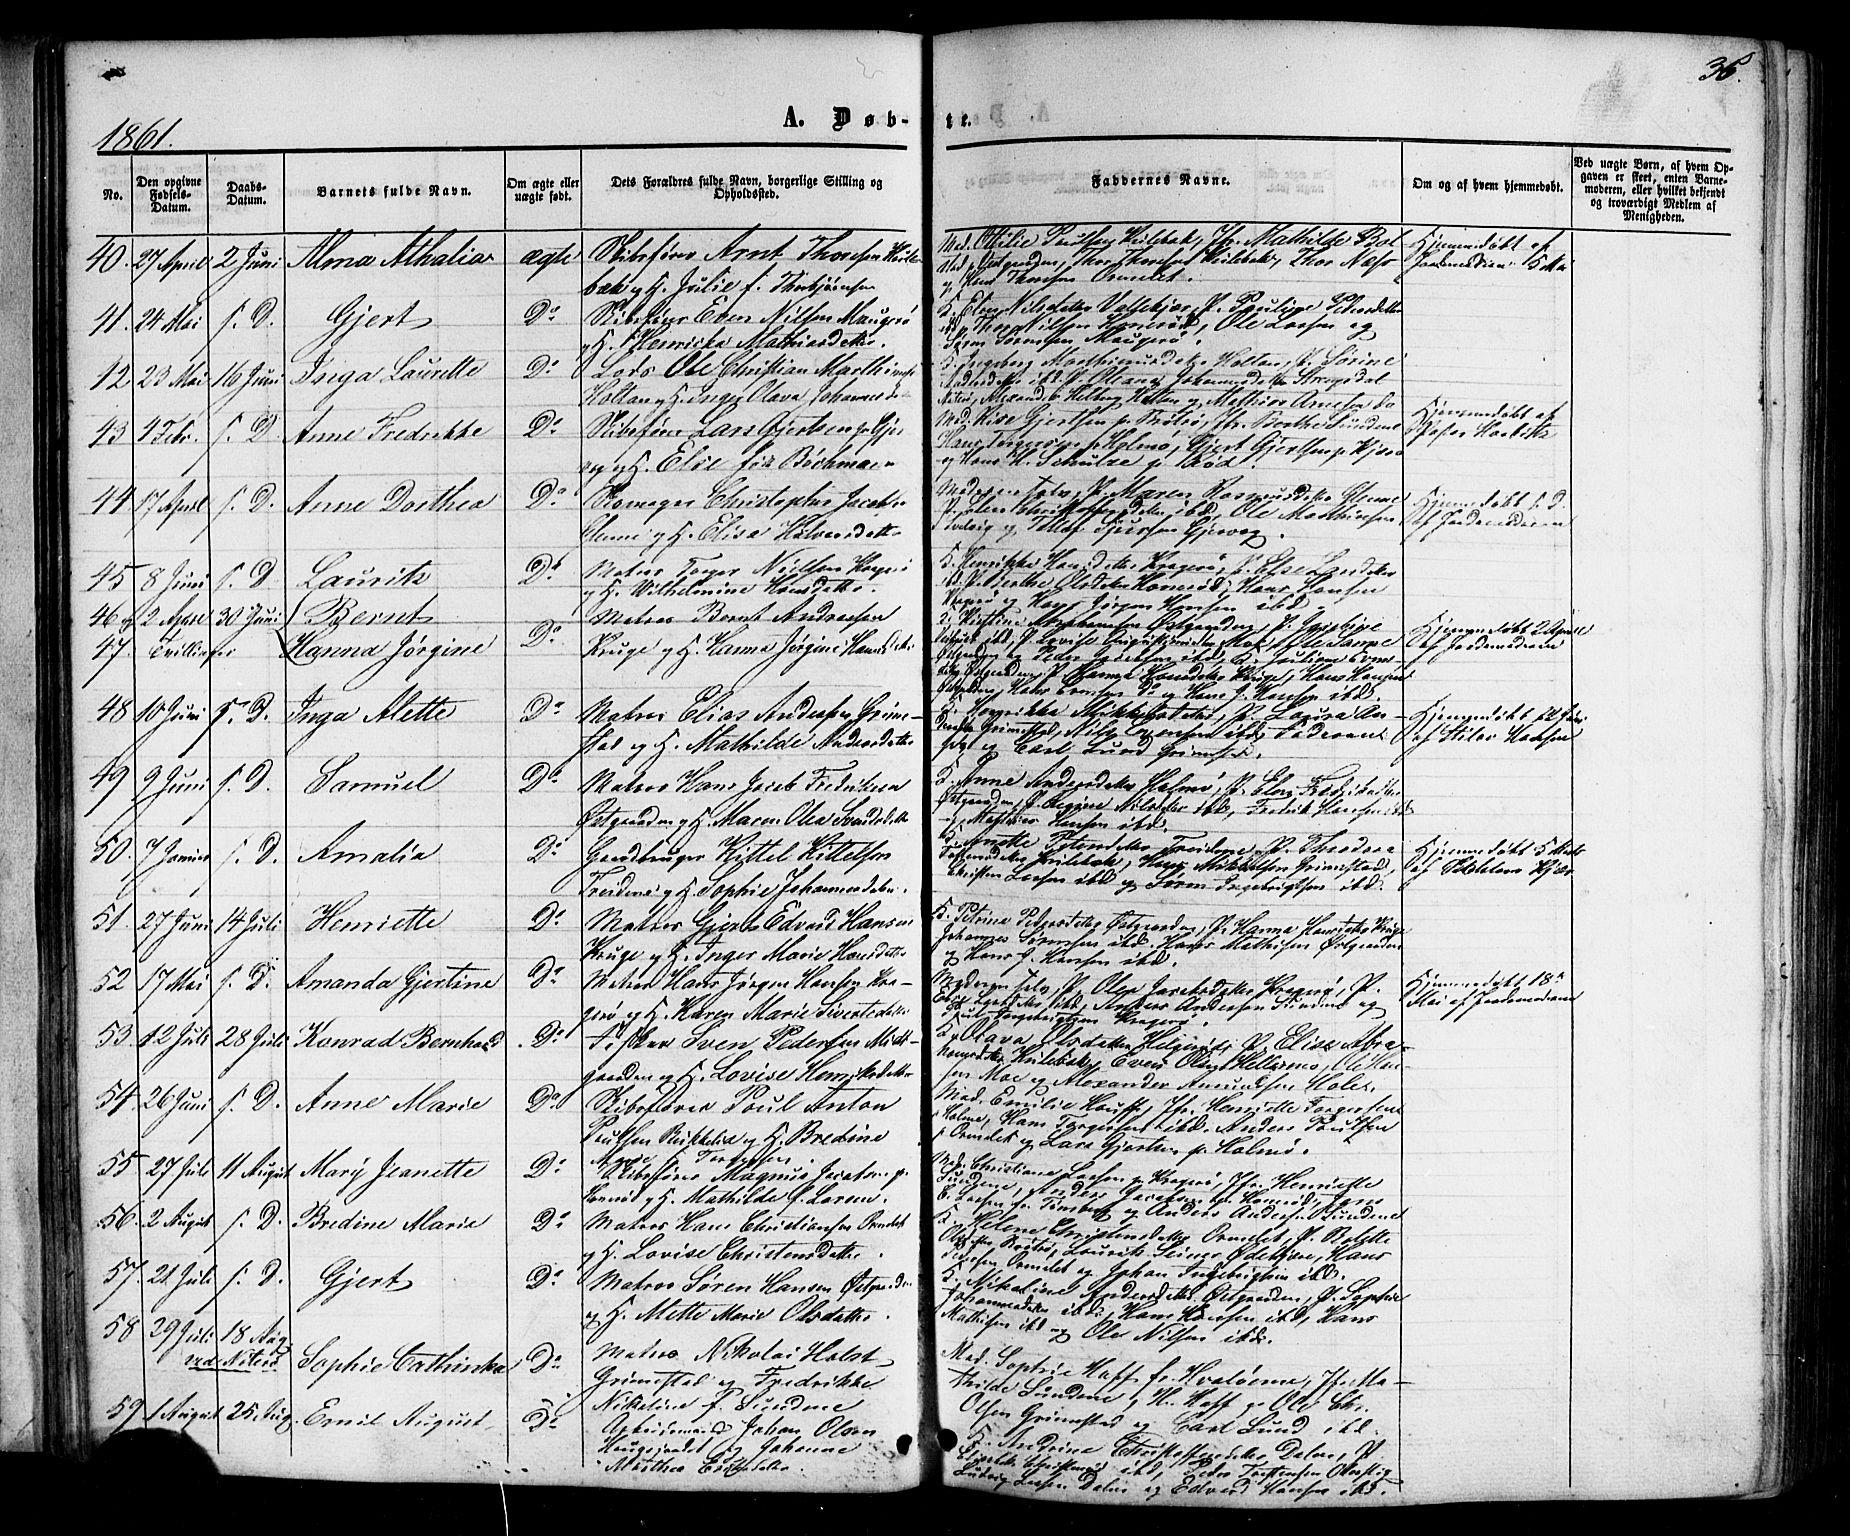 SAKO, Nøtterøy kirkebøker, G/Gb/L0001: Klokkerbok nr. II 1, 1856-1874, s. 36